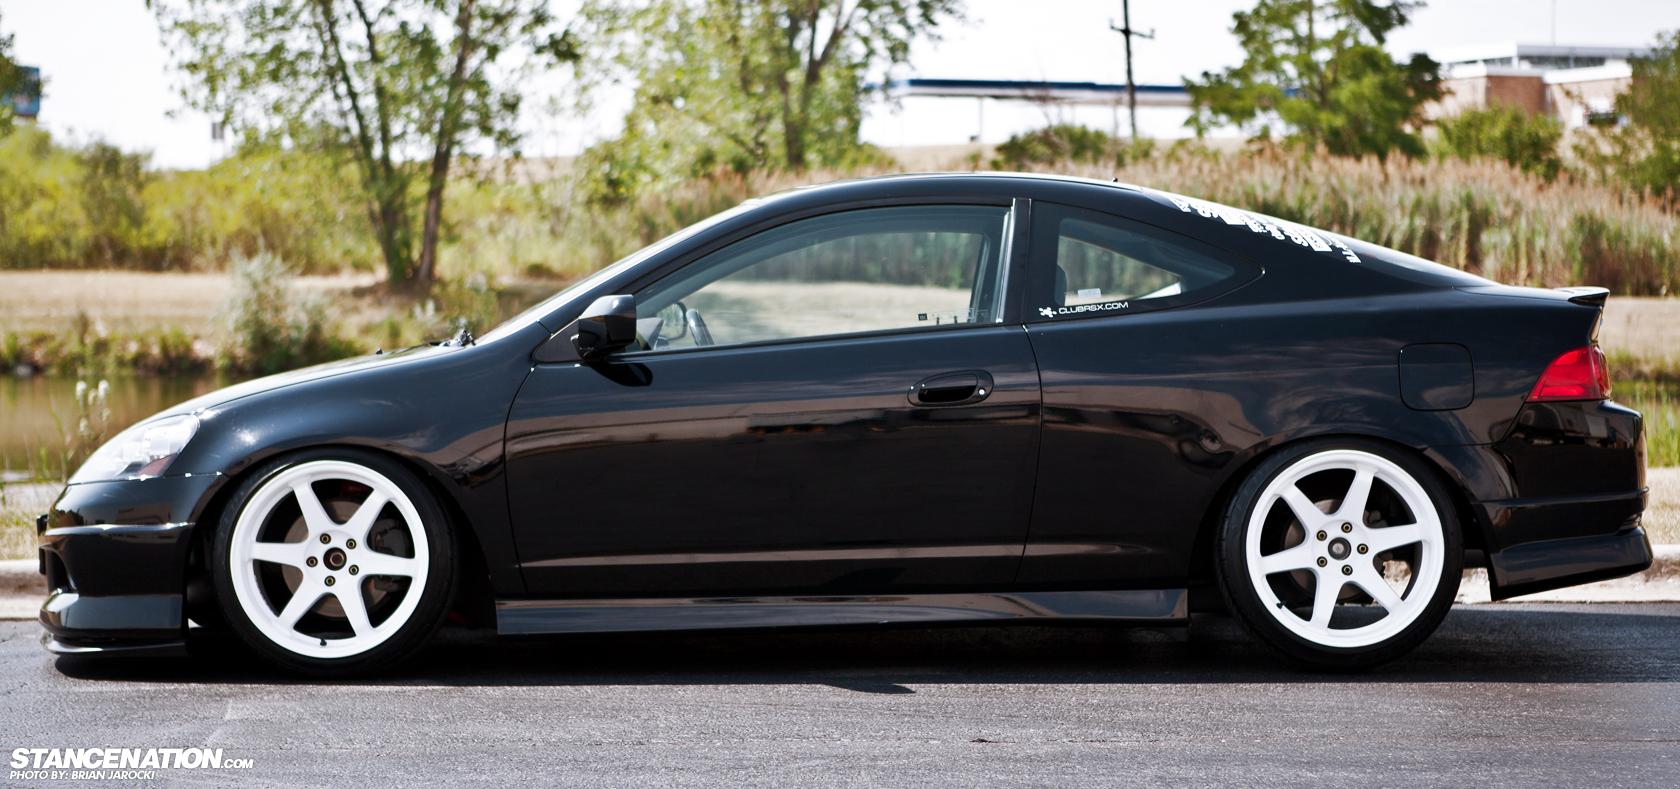 Illownois // Juan Tamayo's Acura RSX. | StanceNation™ // Form > Function